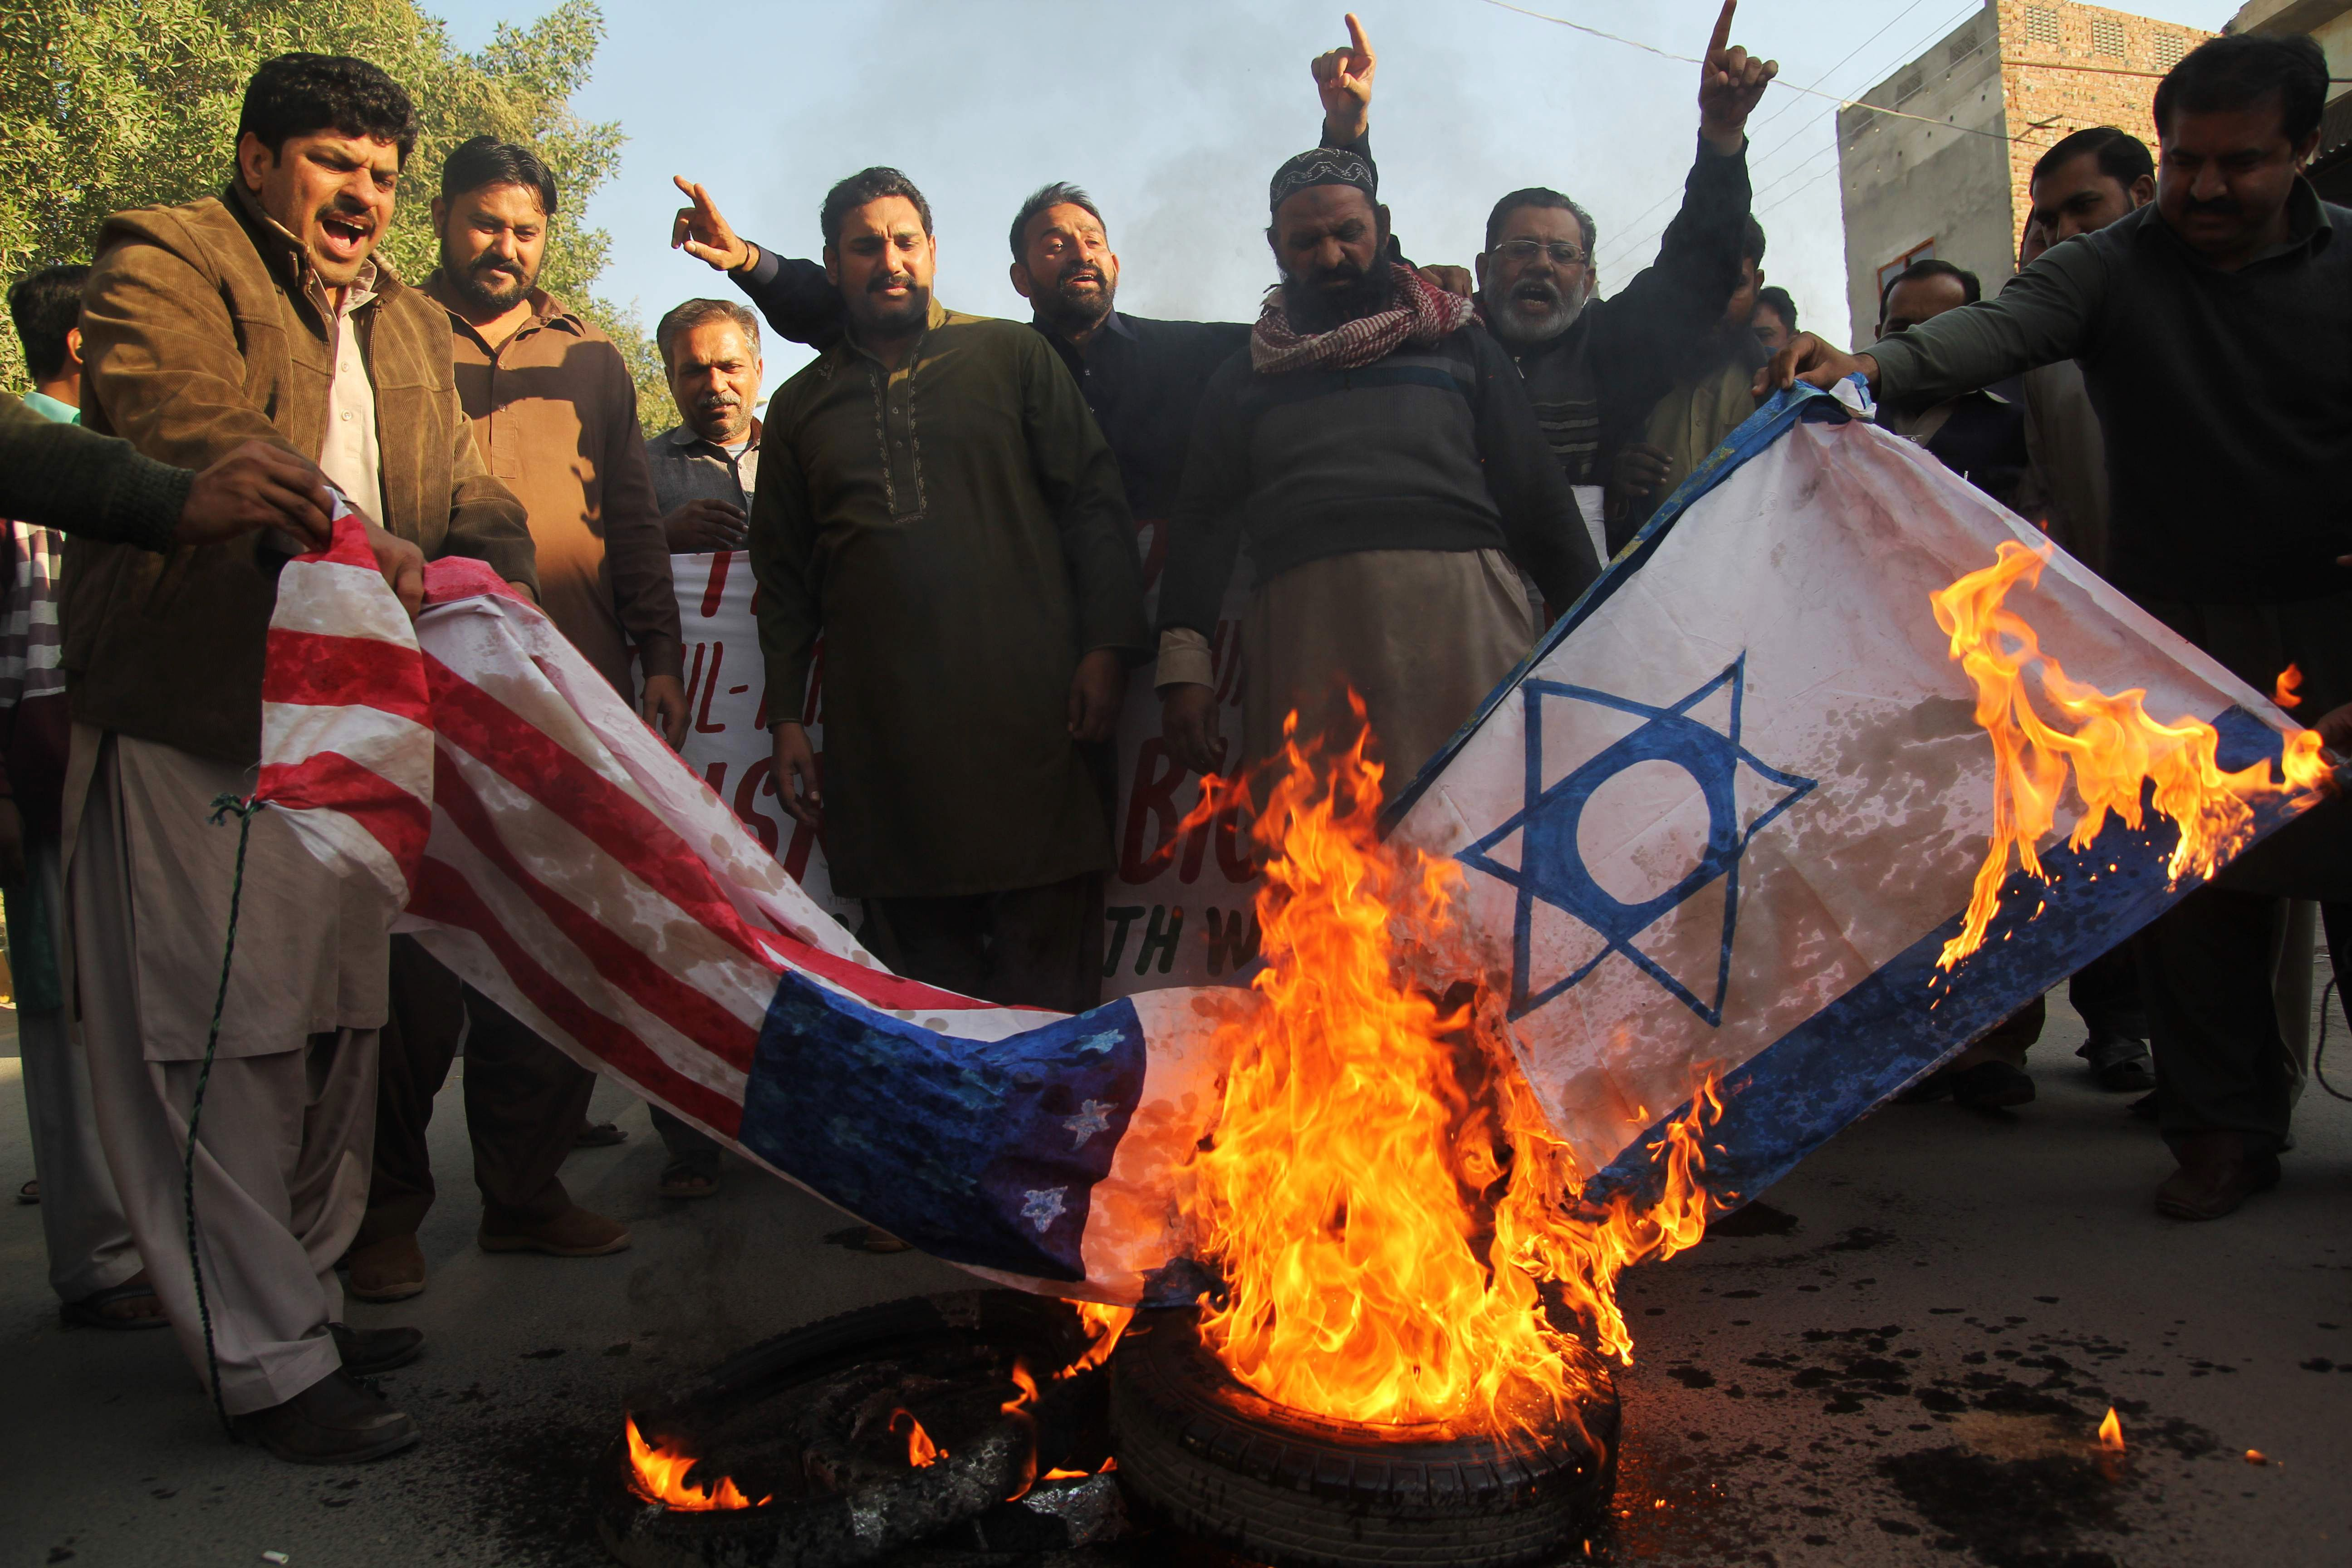 باكستانيون يحتجون ضد قرار ترامب